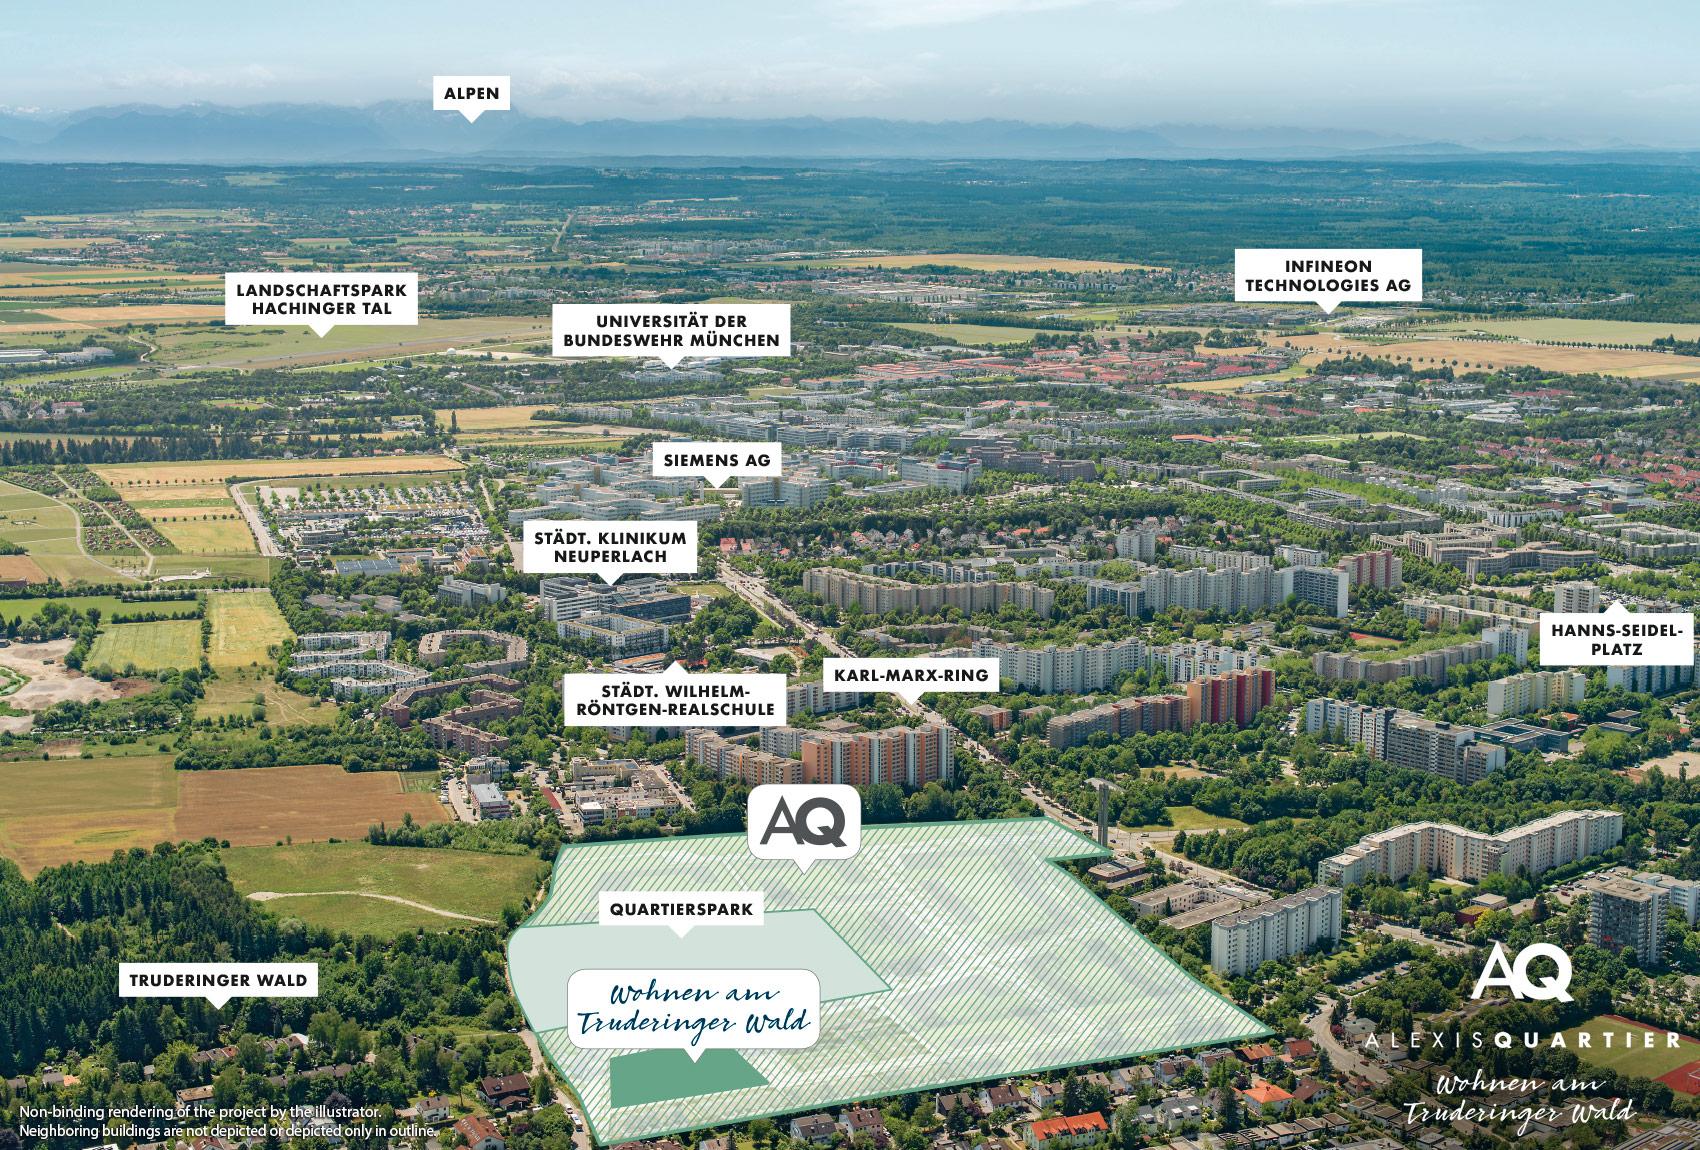 Property Alexisquartier - Wohnen am Truderinger Wald - aerial photo